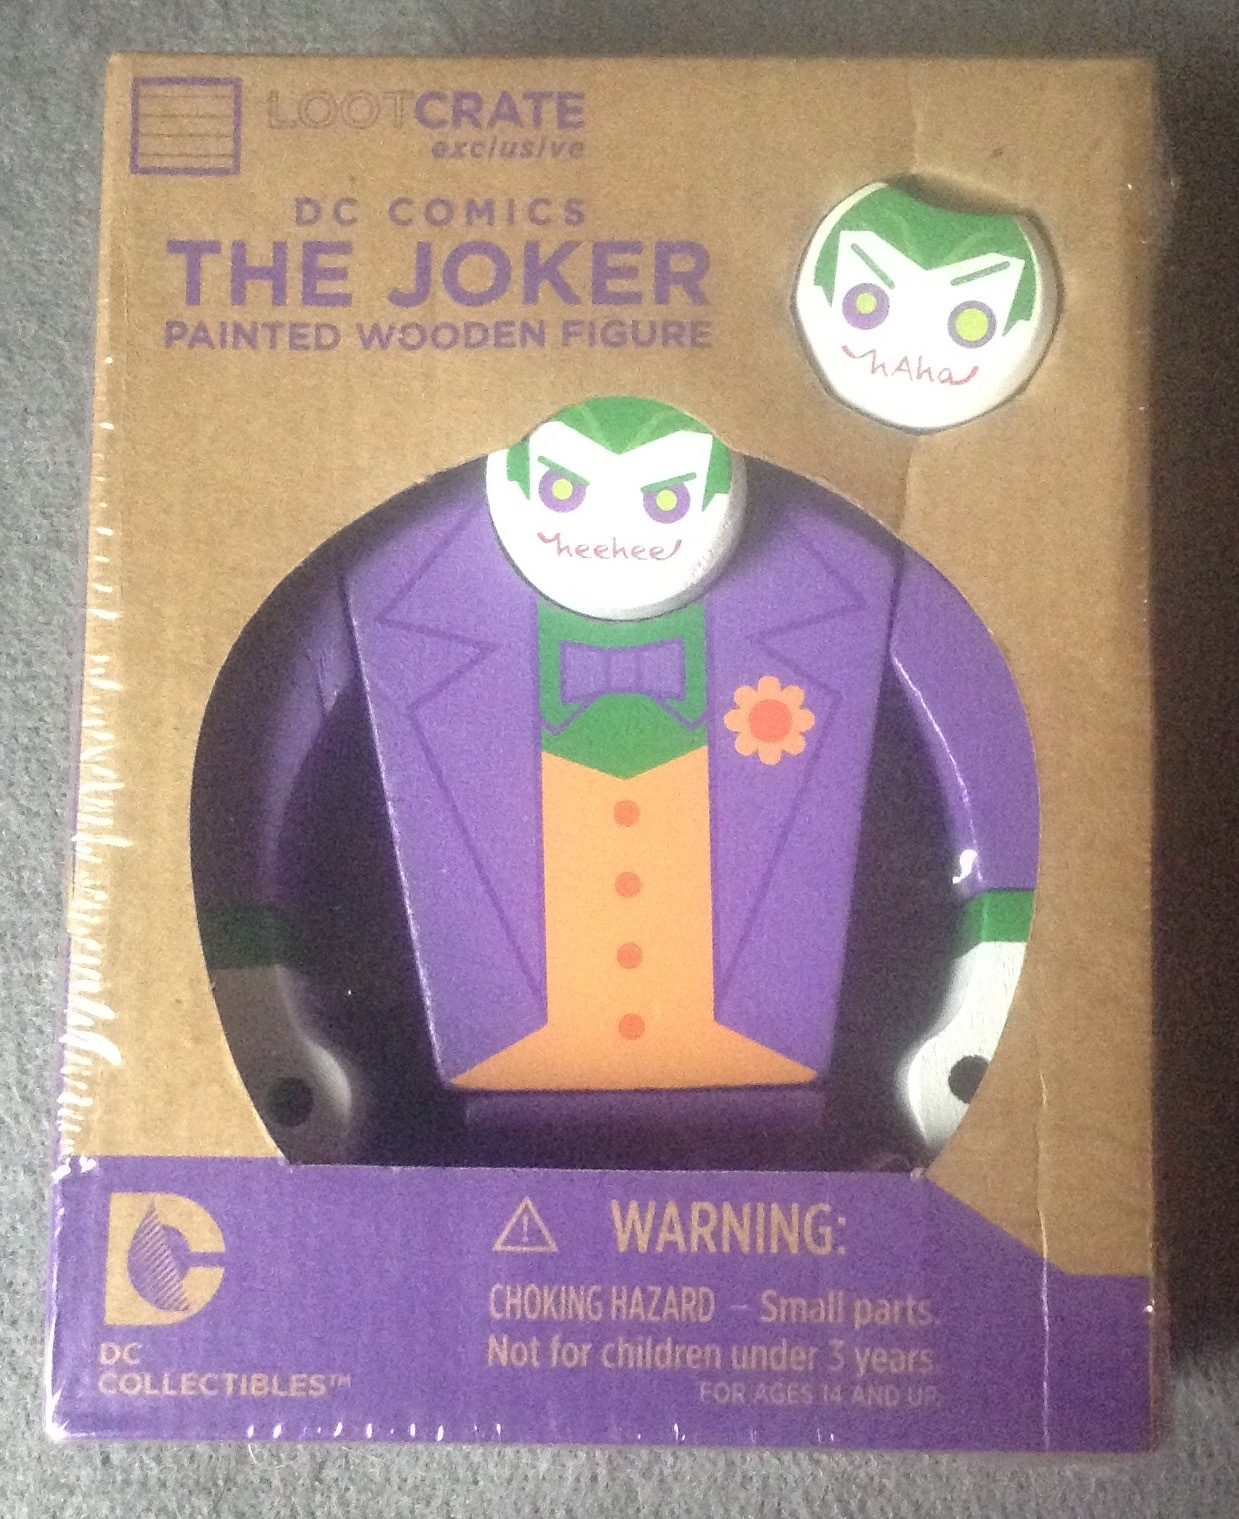 Lootcrate Exclusive DC Comics The Joker Painted Wooden Figure